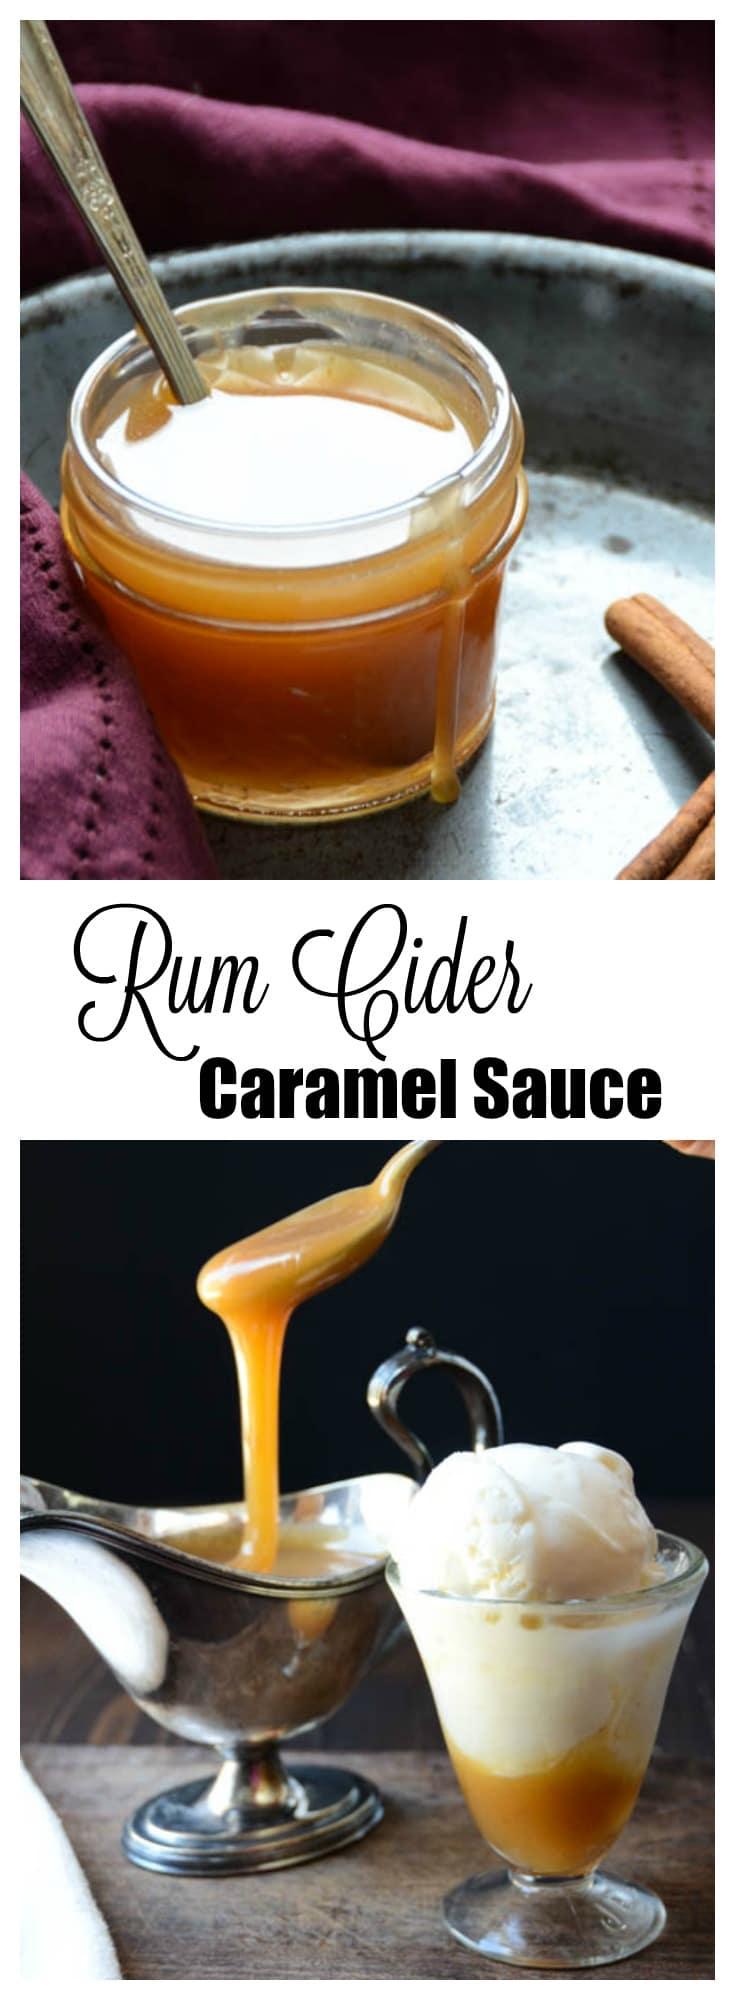 rum-cider-caramel-sauce